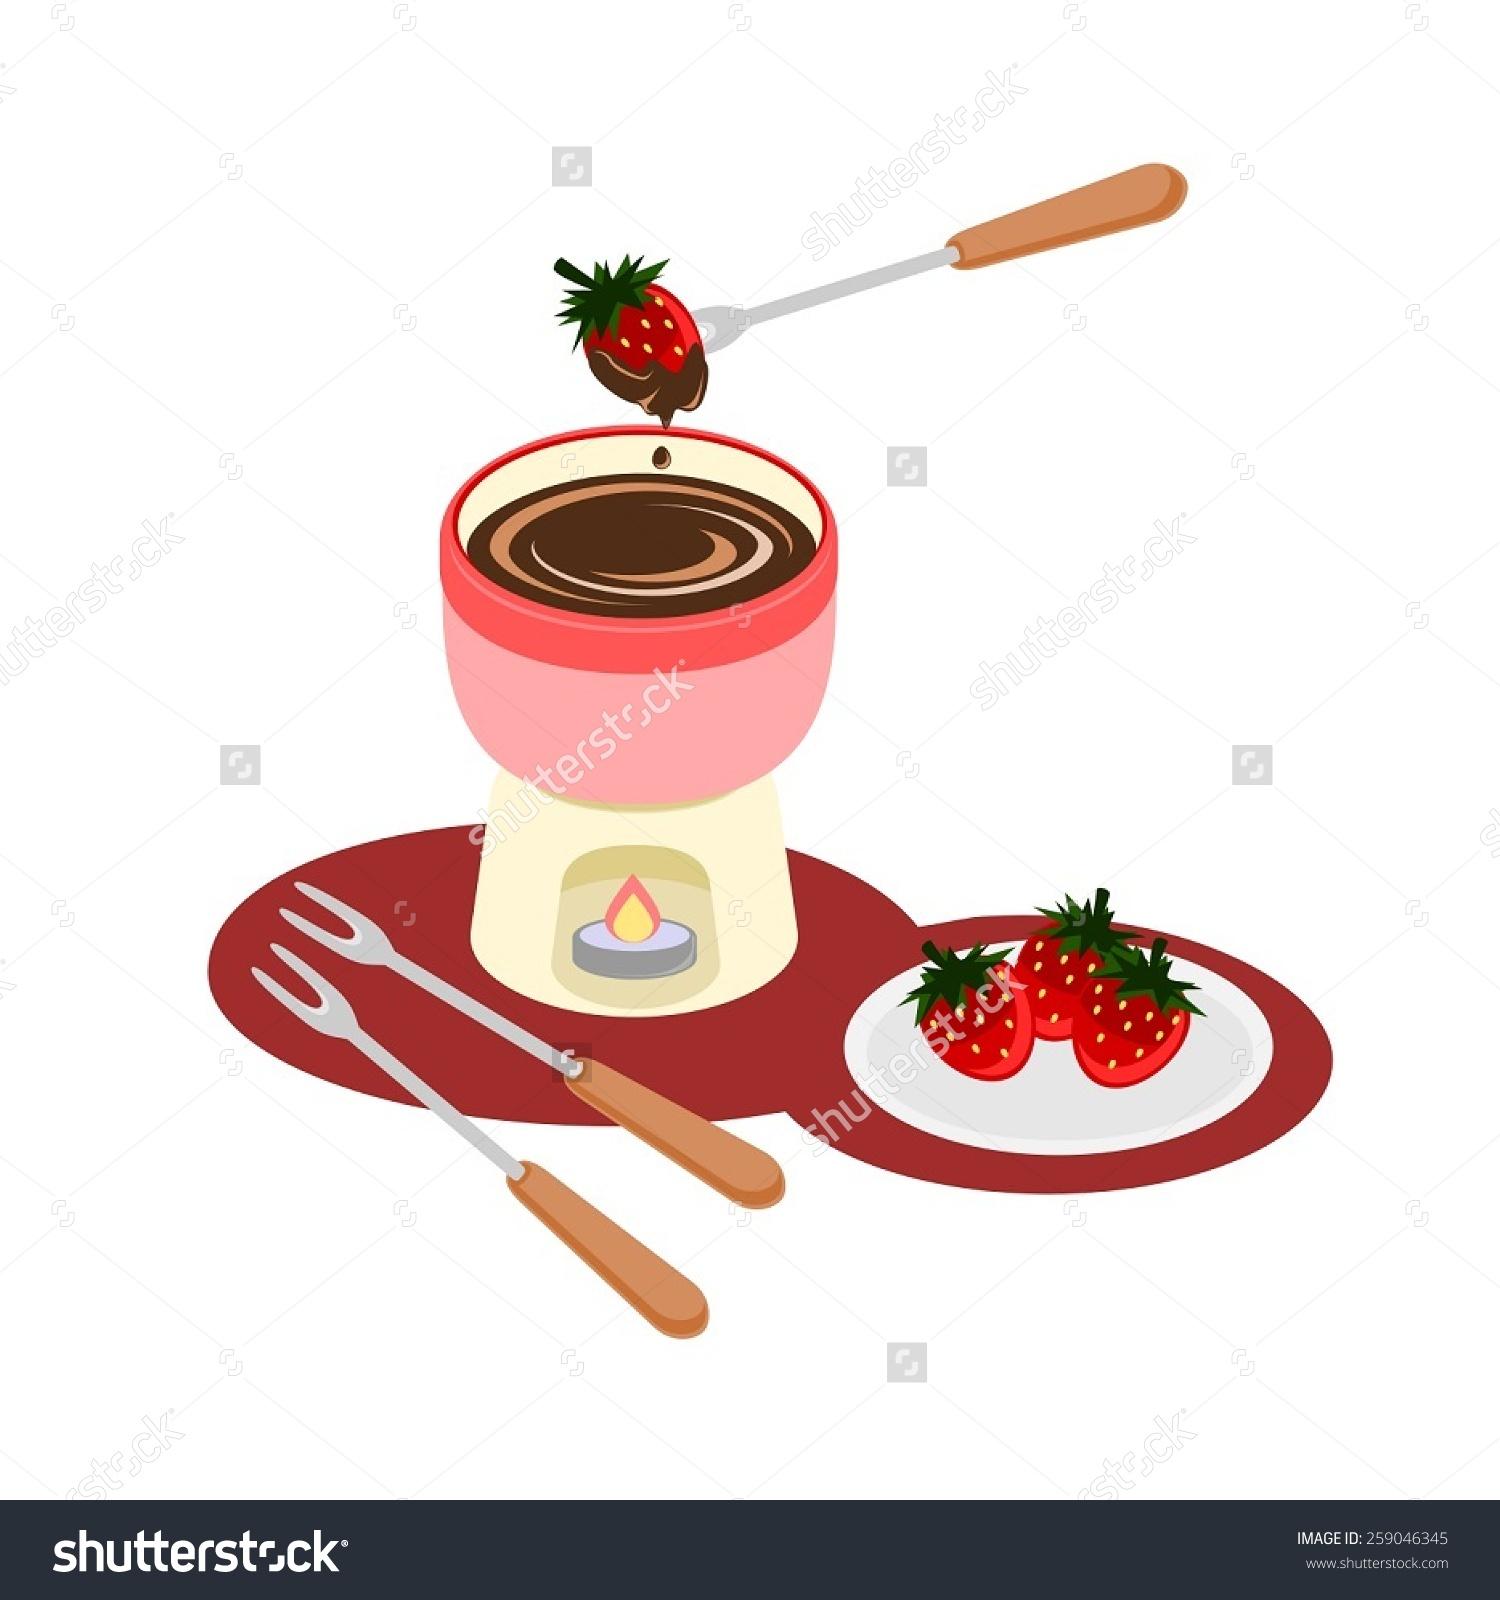 Chocolate fondue clip art.